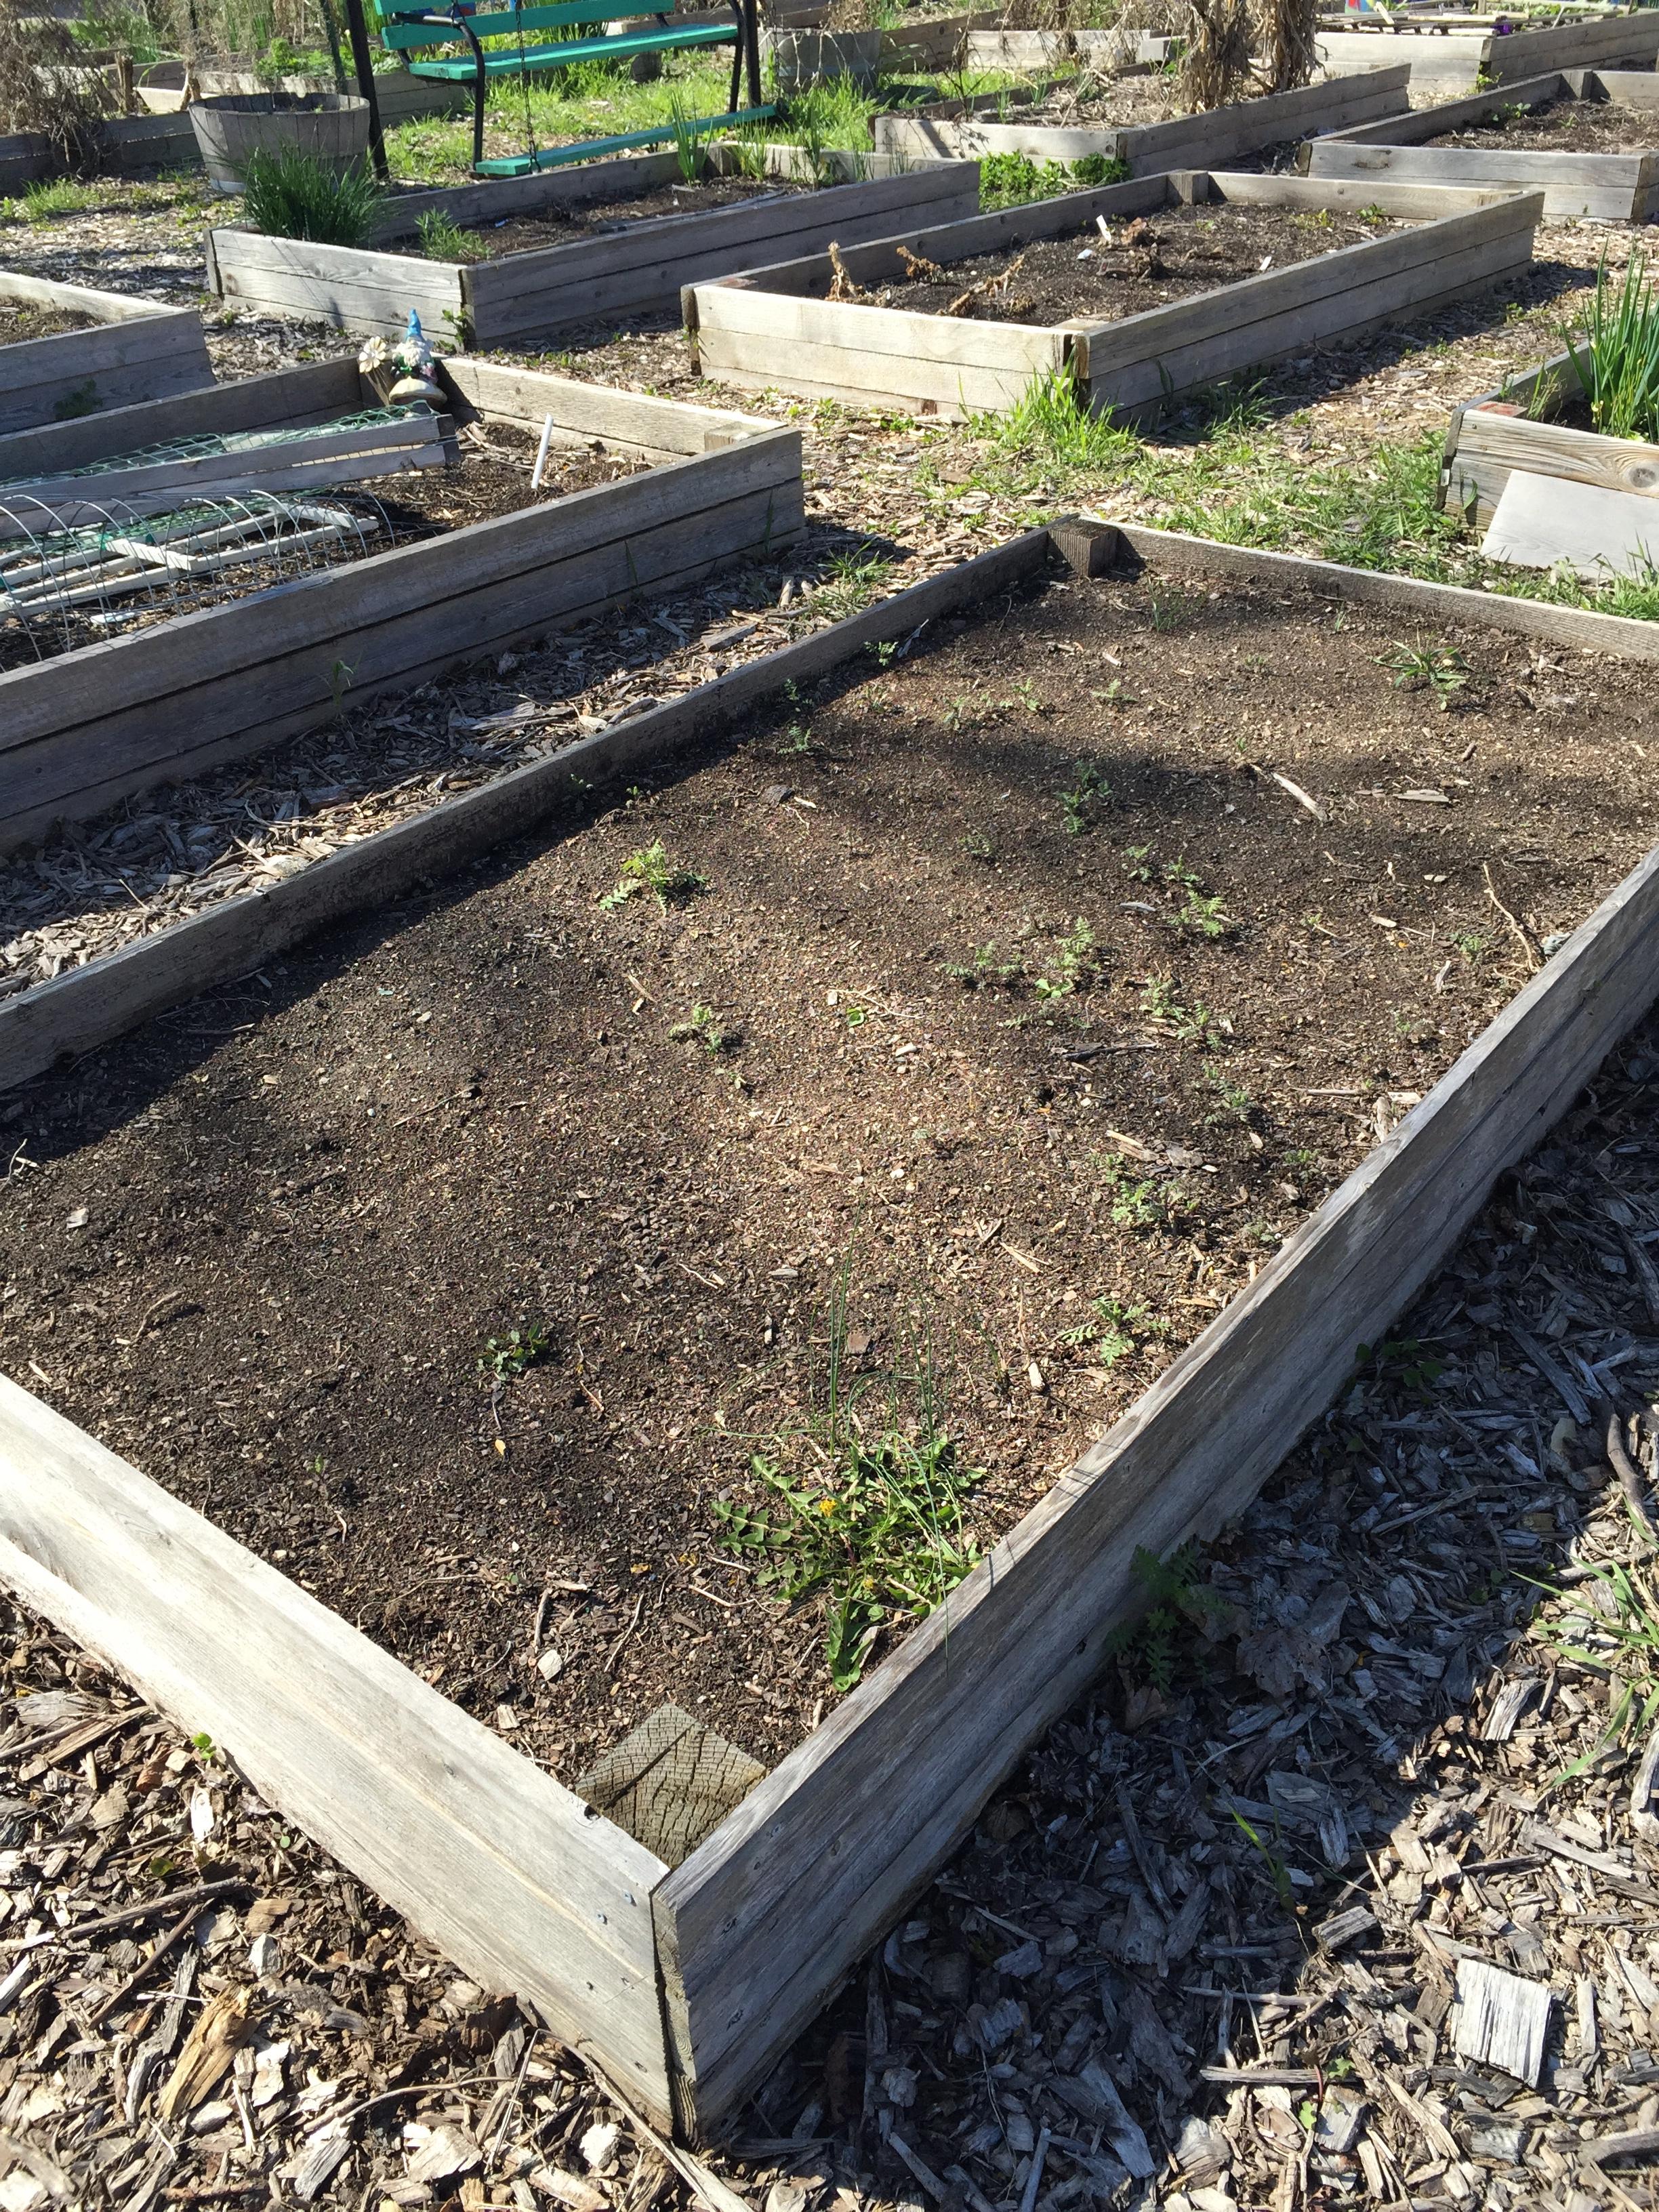 plot #6, forest park community garden, pre-preparation